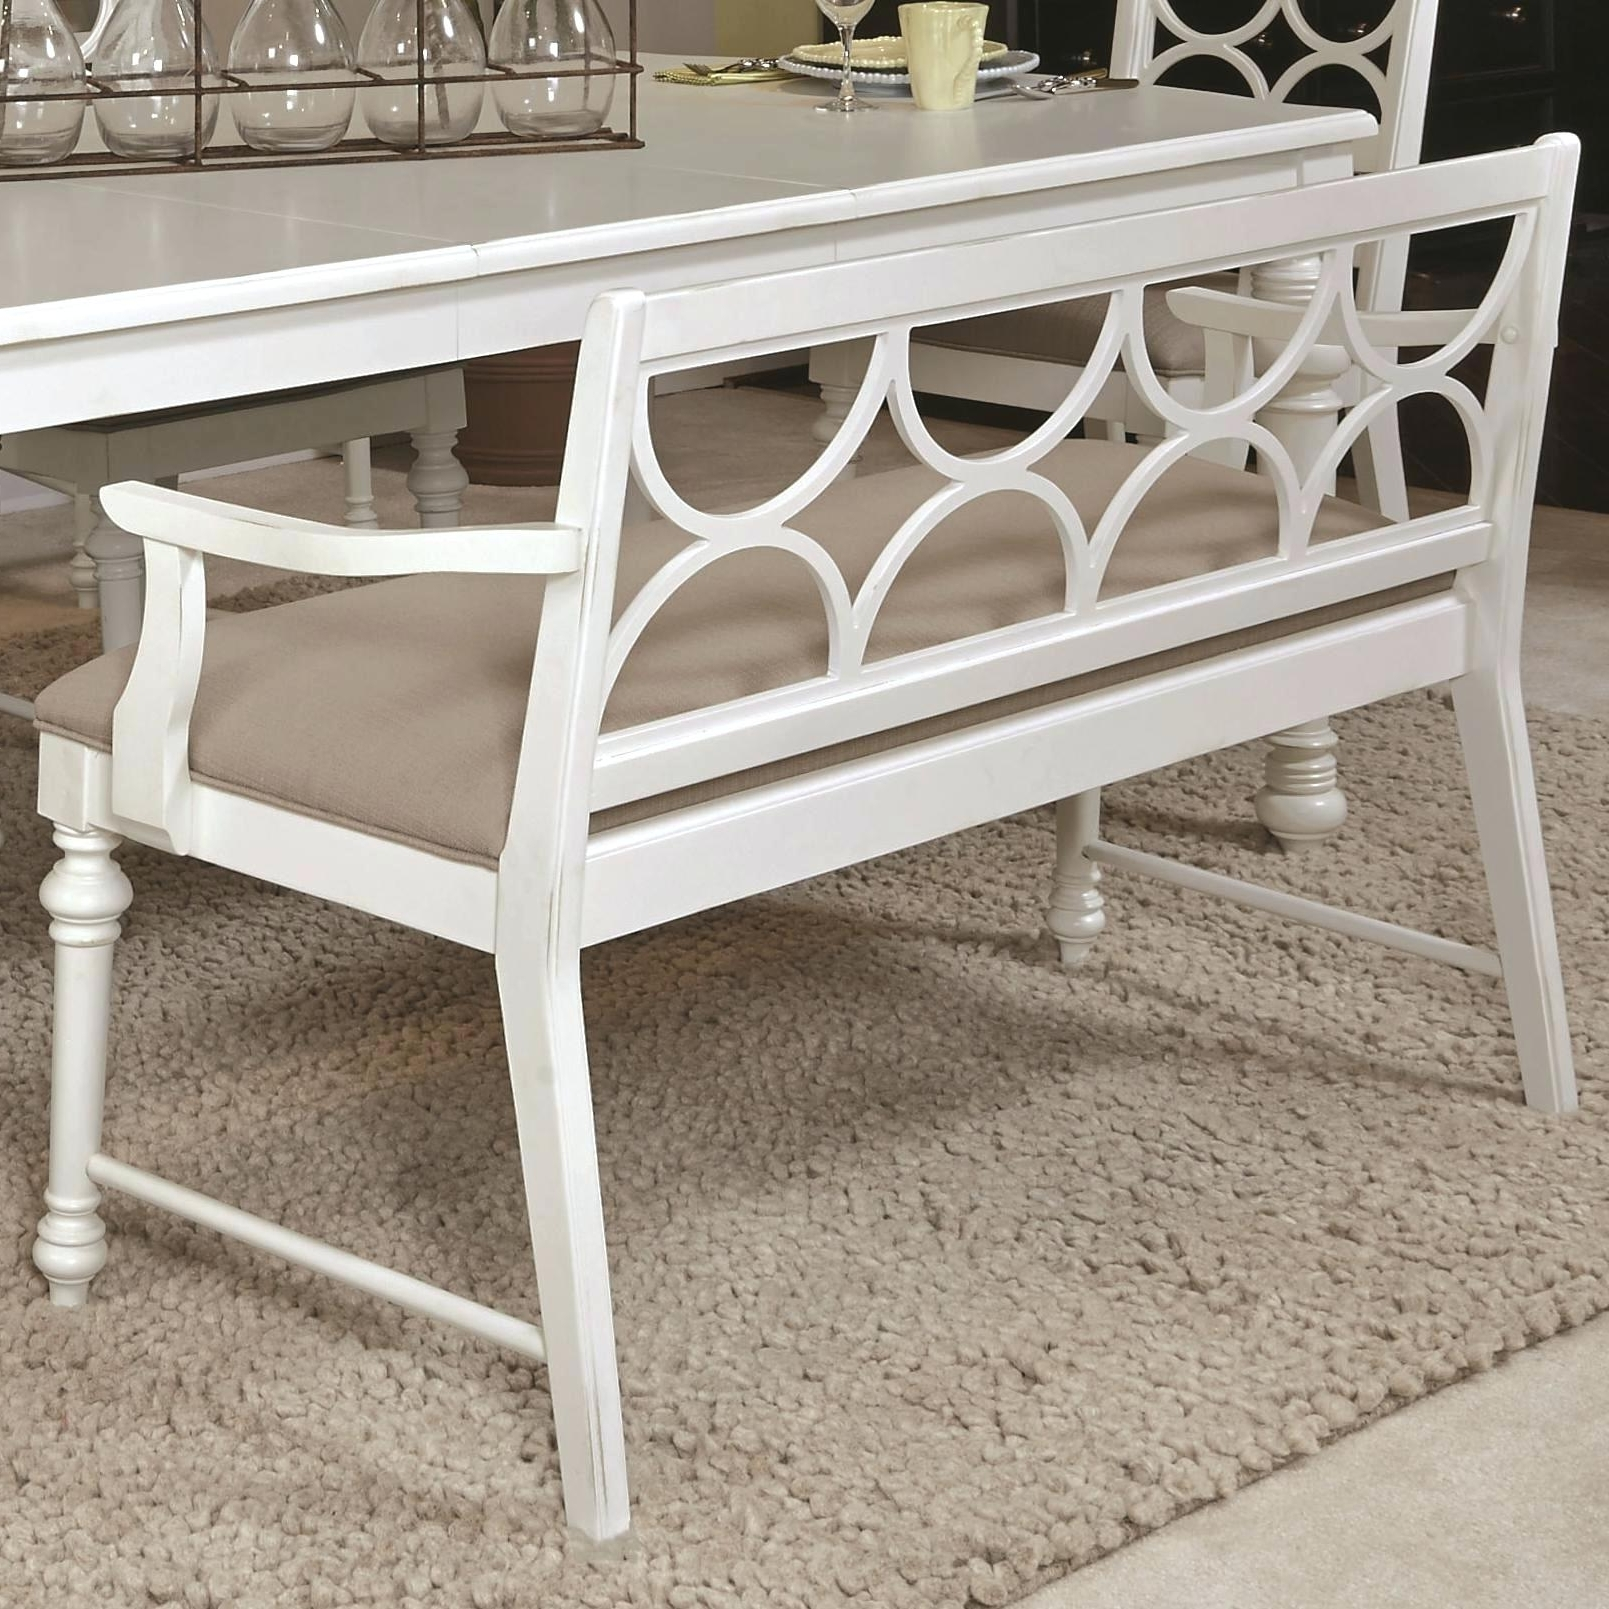 Wood Dining Bench With Back – Veelablog Regarding Newest Bench With Back For Dining Tables (View 16 of 25)